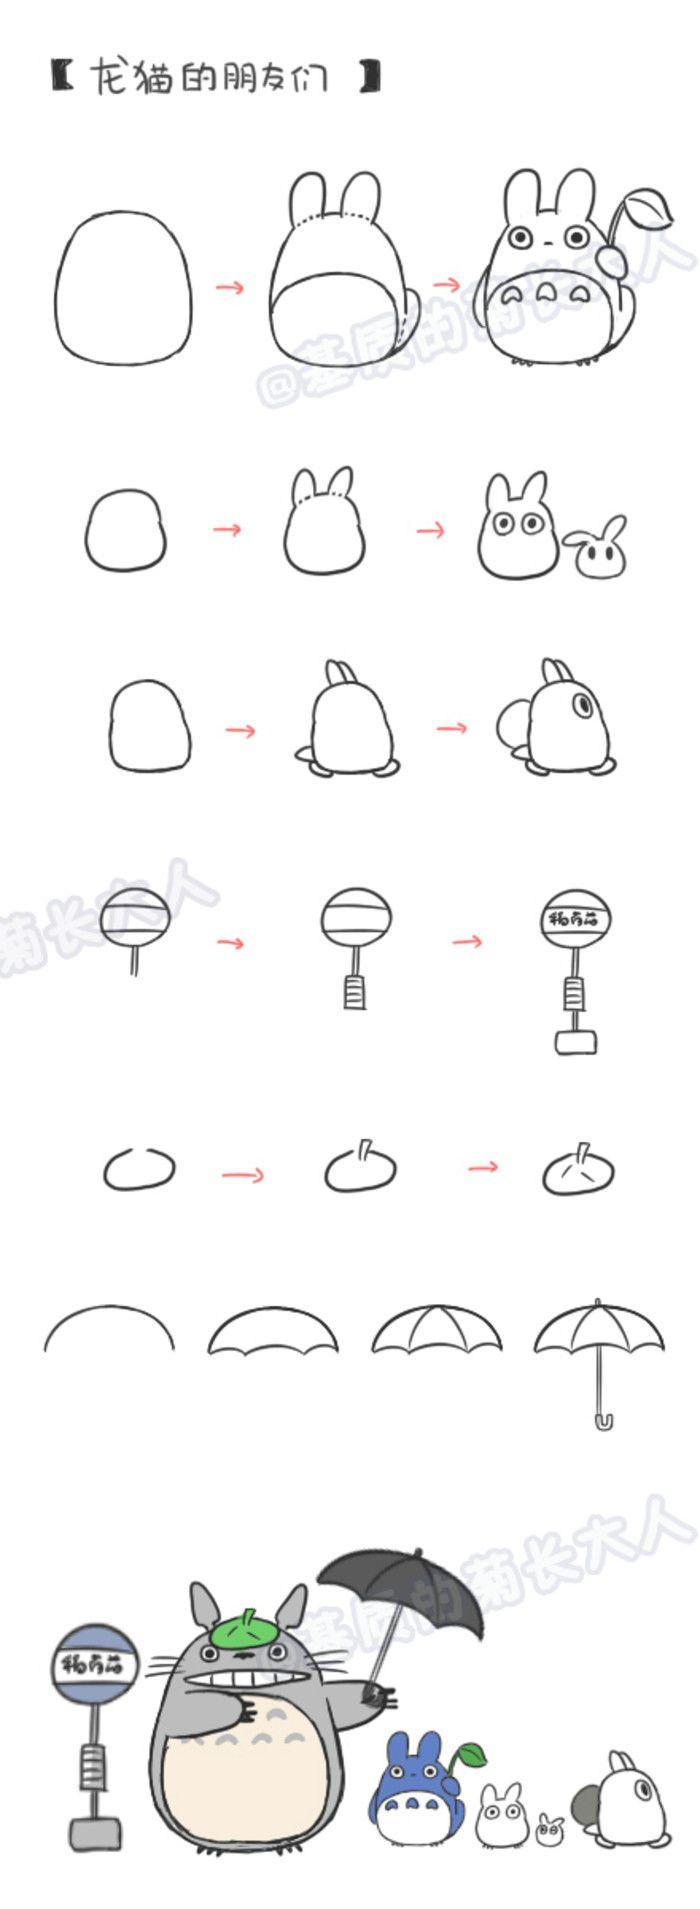 How To Draw Chinchilla Friends  Ju @ Matrix Grew From People